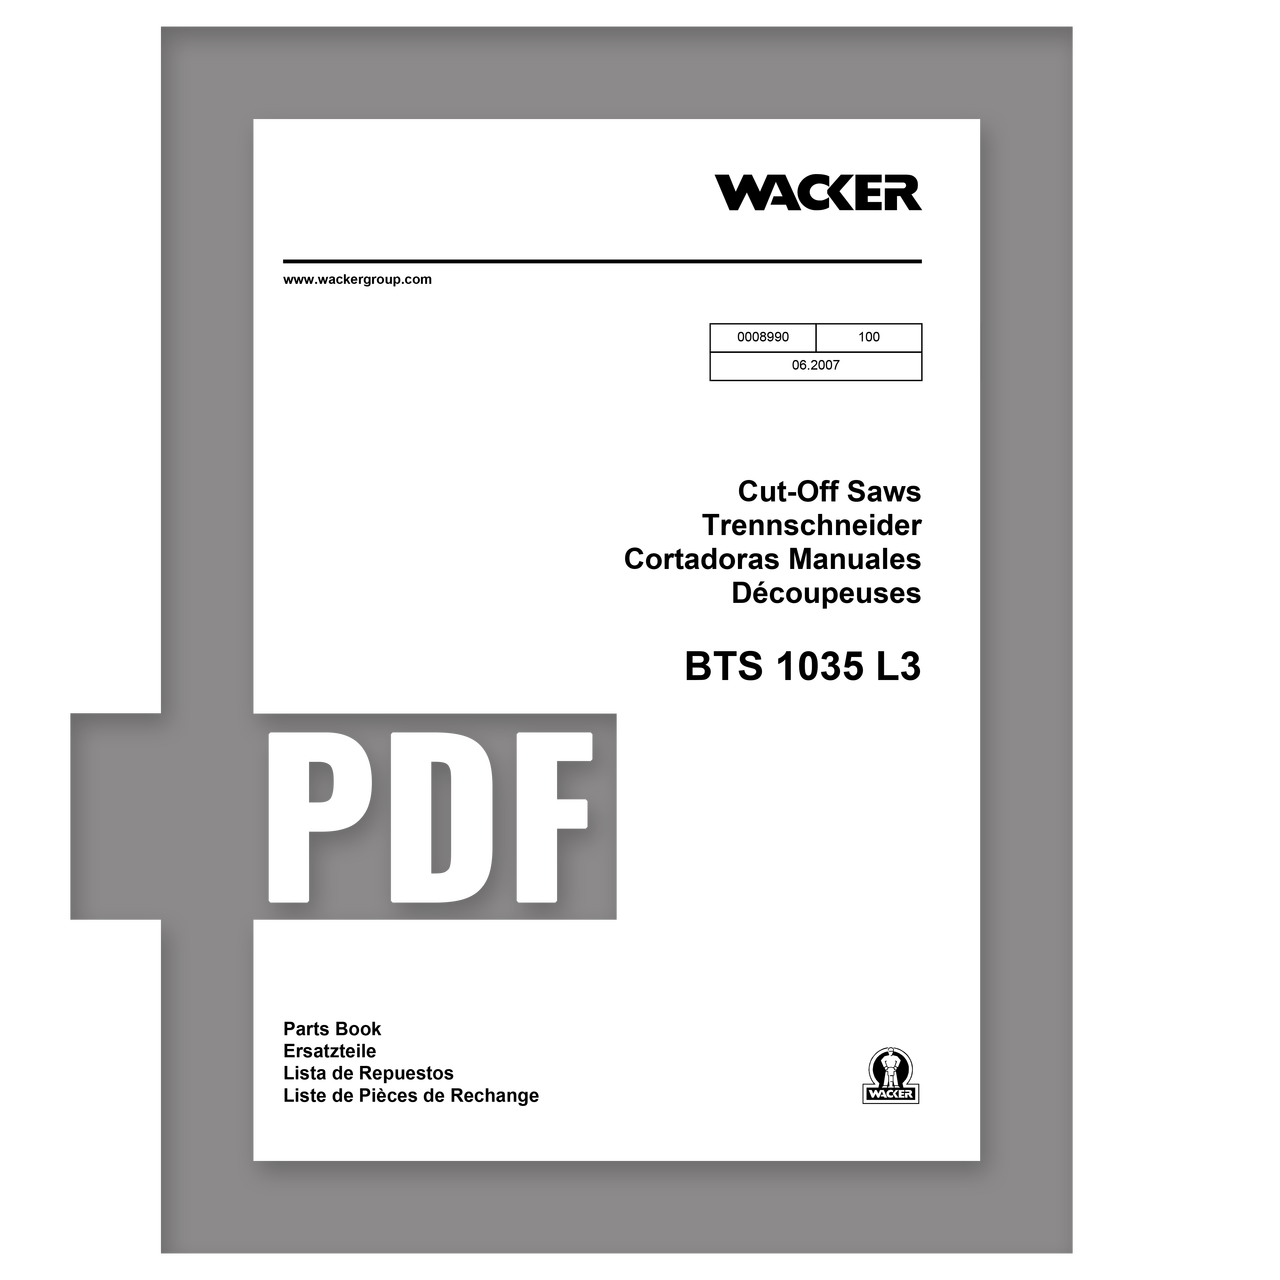 Generator Wiring Diagrams Wacker Electrical Diagram For Genset Of Library U2022 Controller